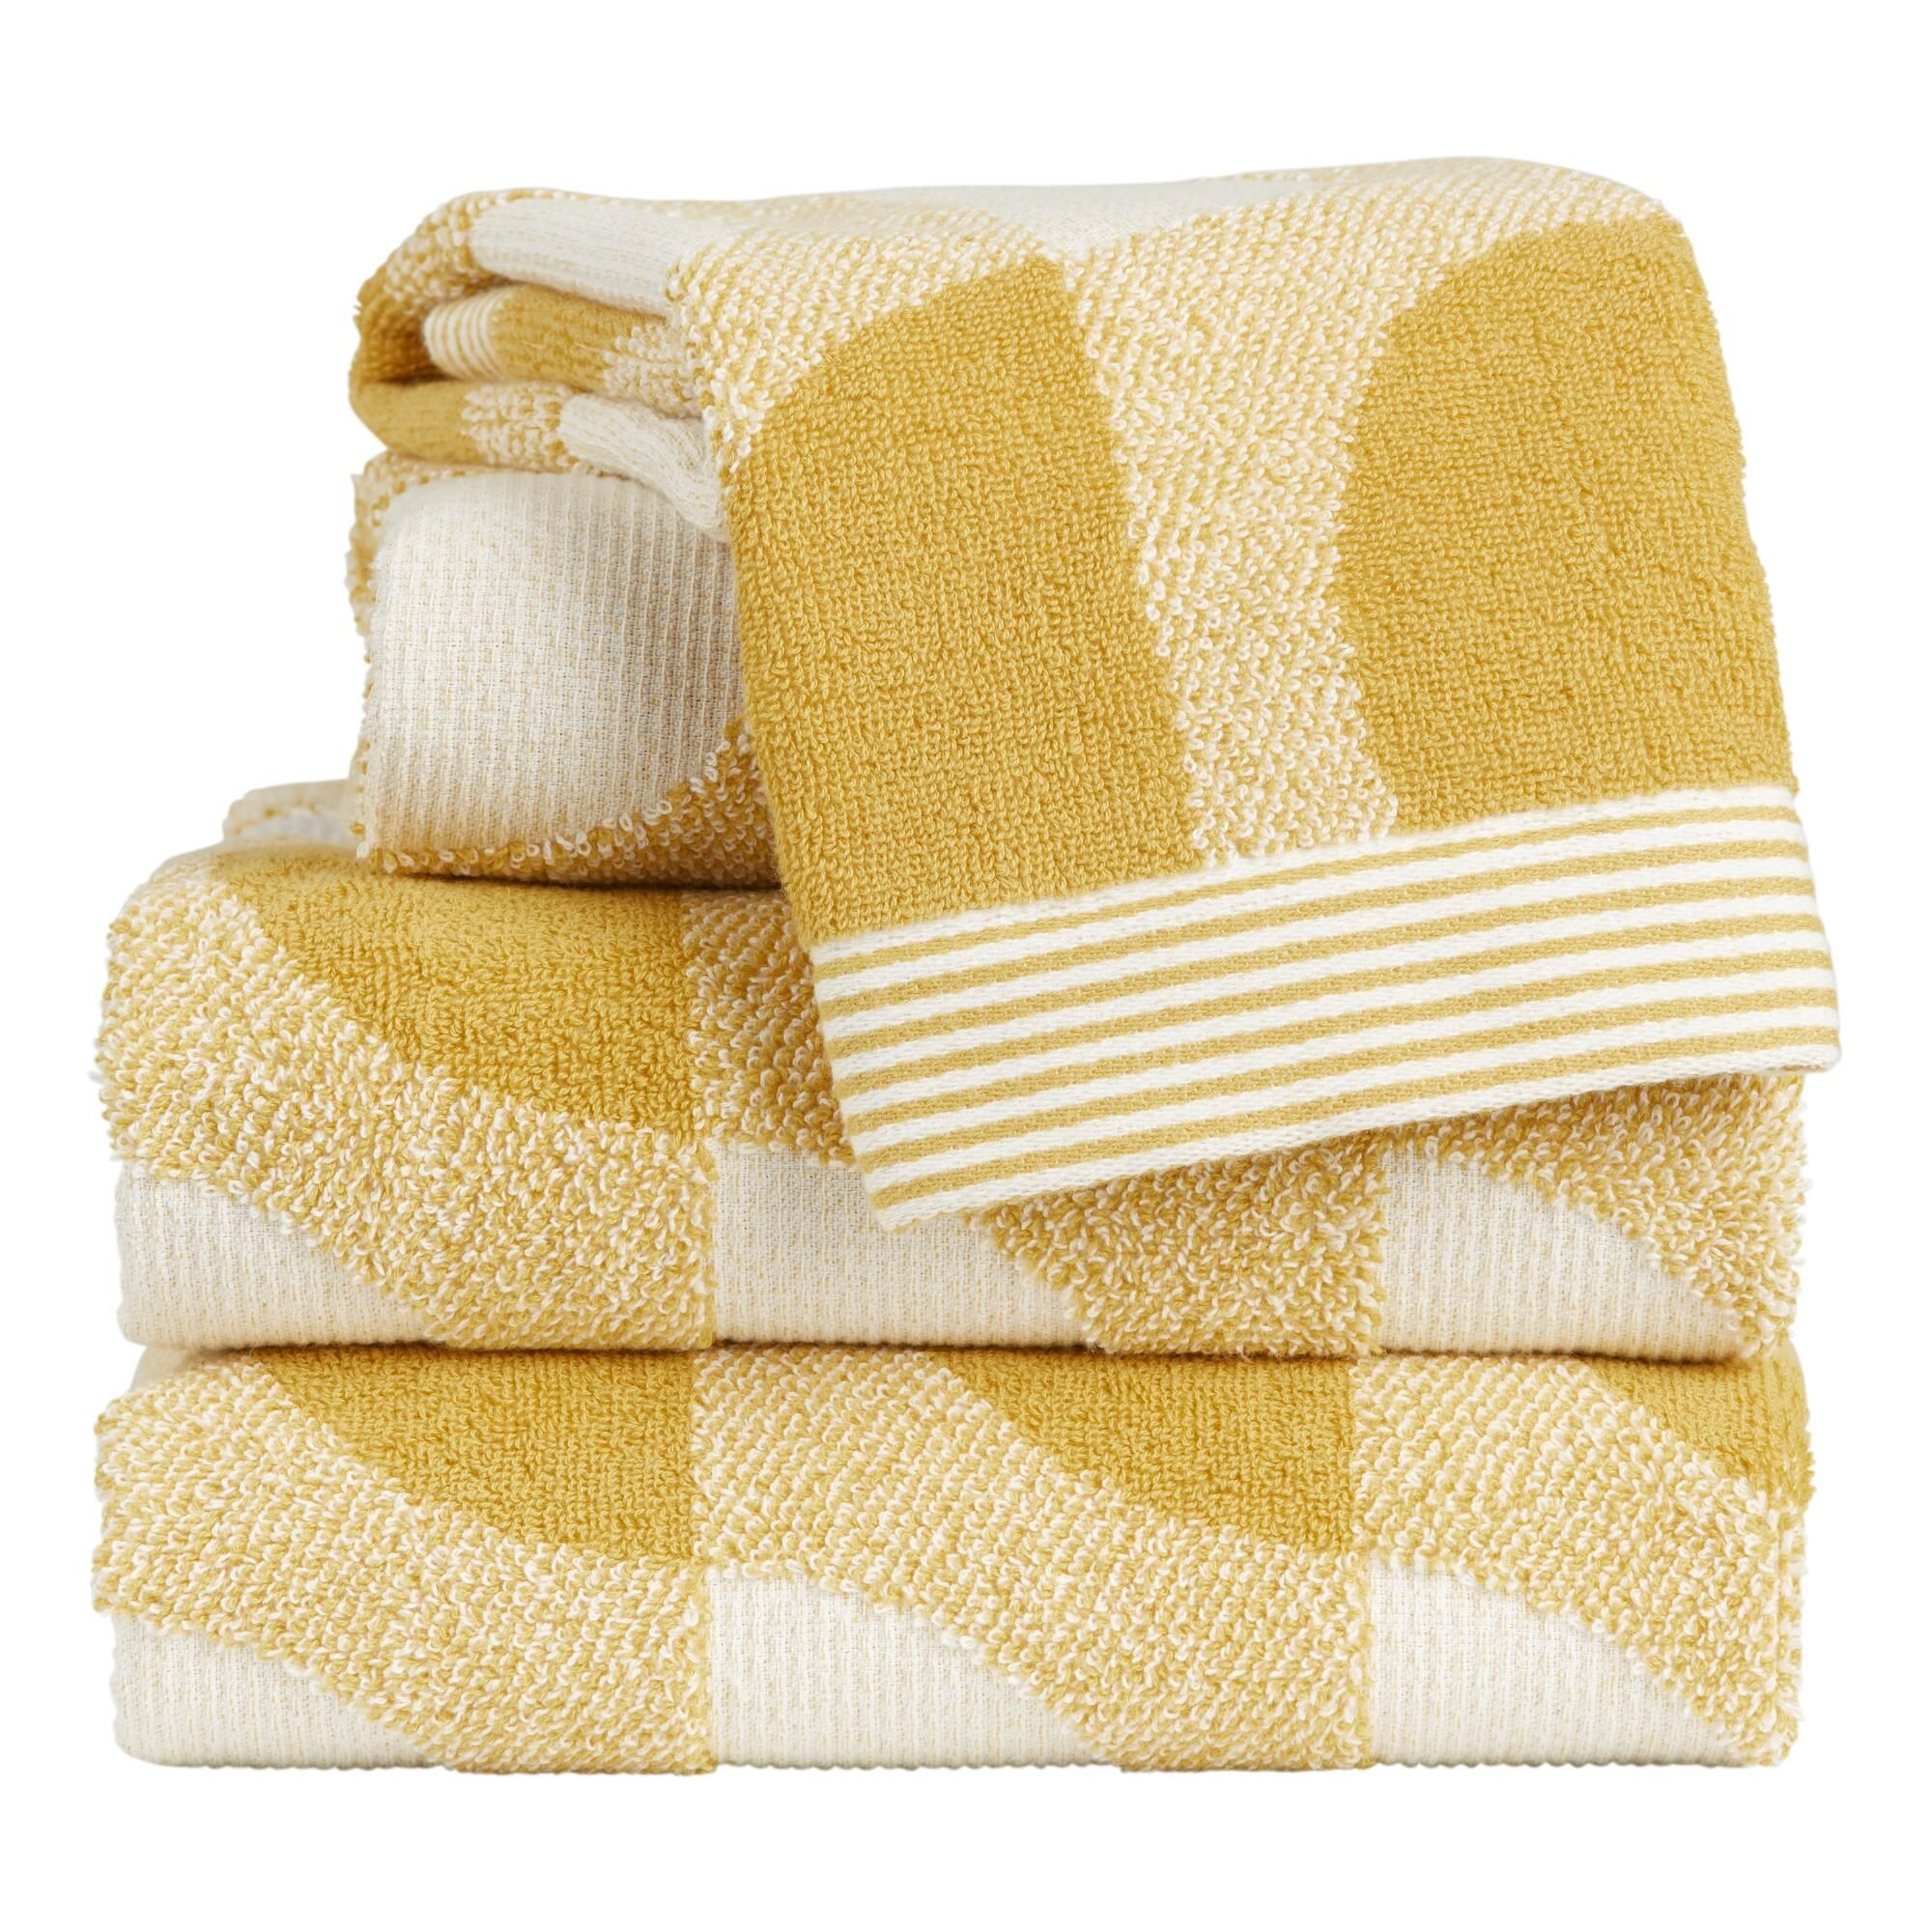 Mustard And Ivory Mod Geo Marlowe Towels In 2020 Towel Jacquard Pattern Bathroom Redo